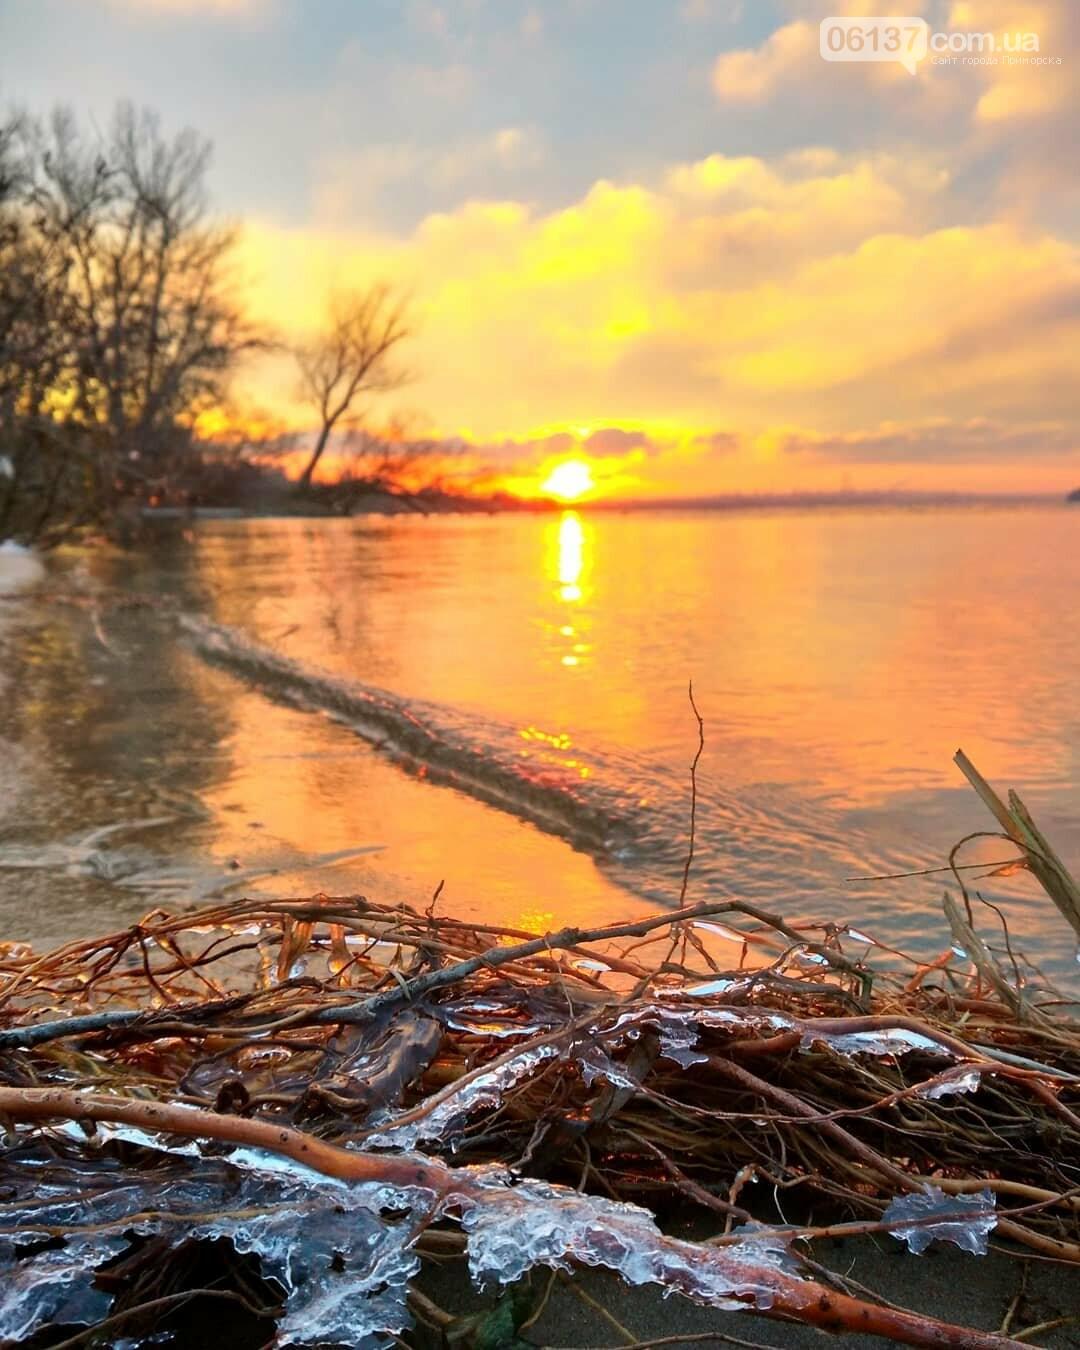 Солнце и лед: рассвет и закат на выходных в Запорожье. Фото  , фото-15